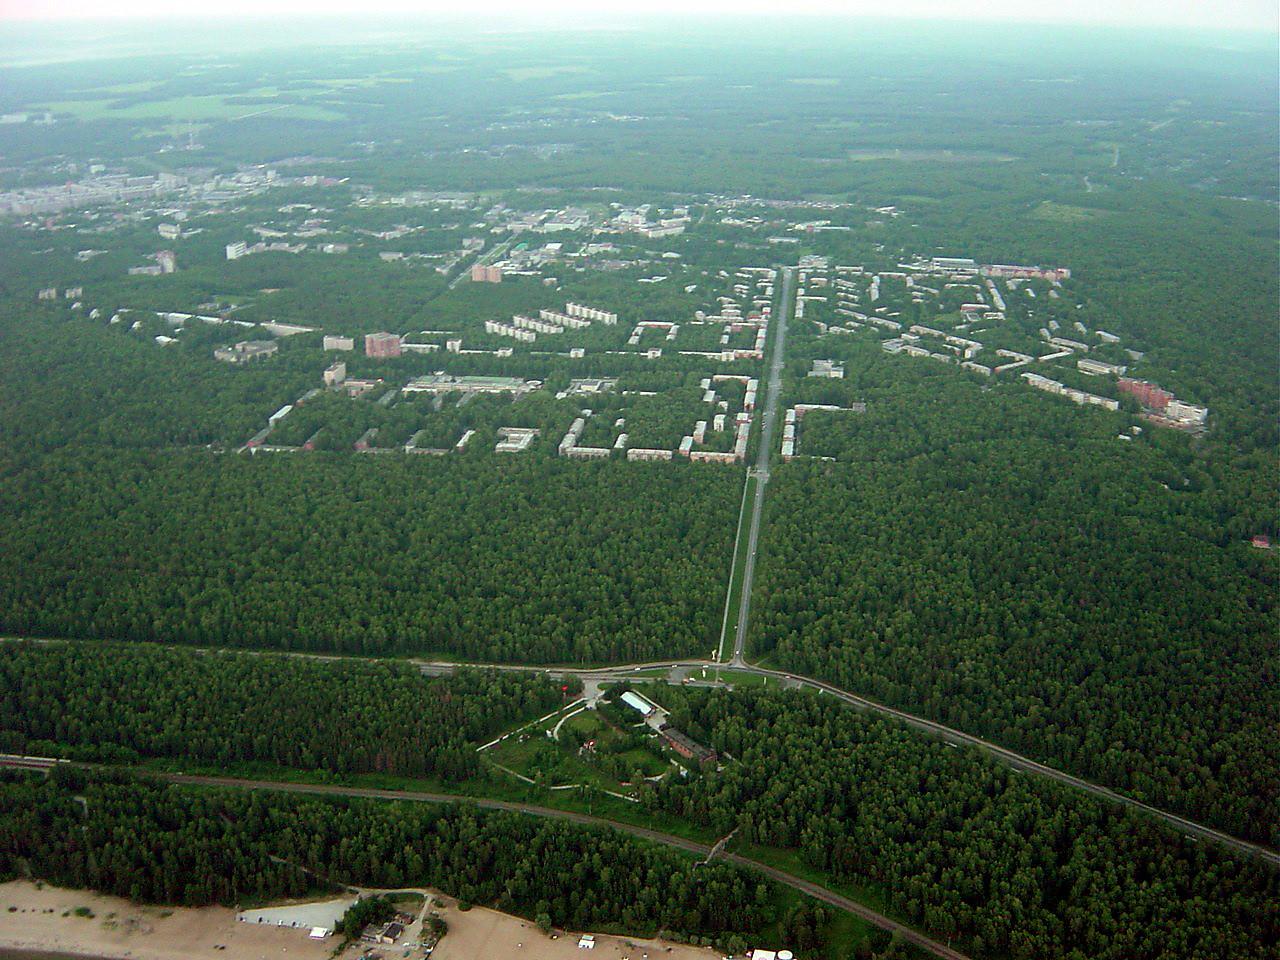 Pogled na Akademgorodok z zraka.